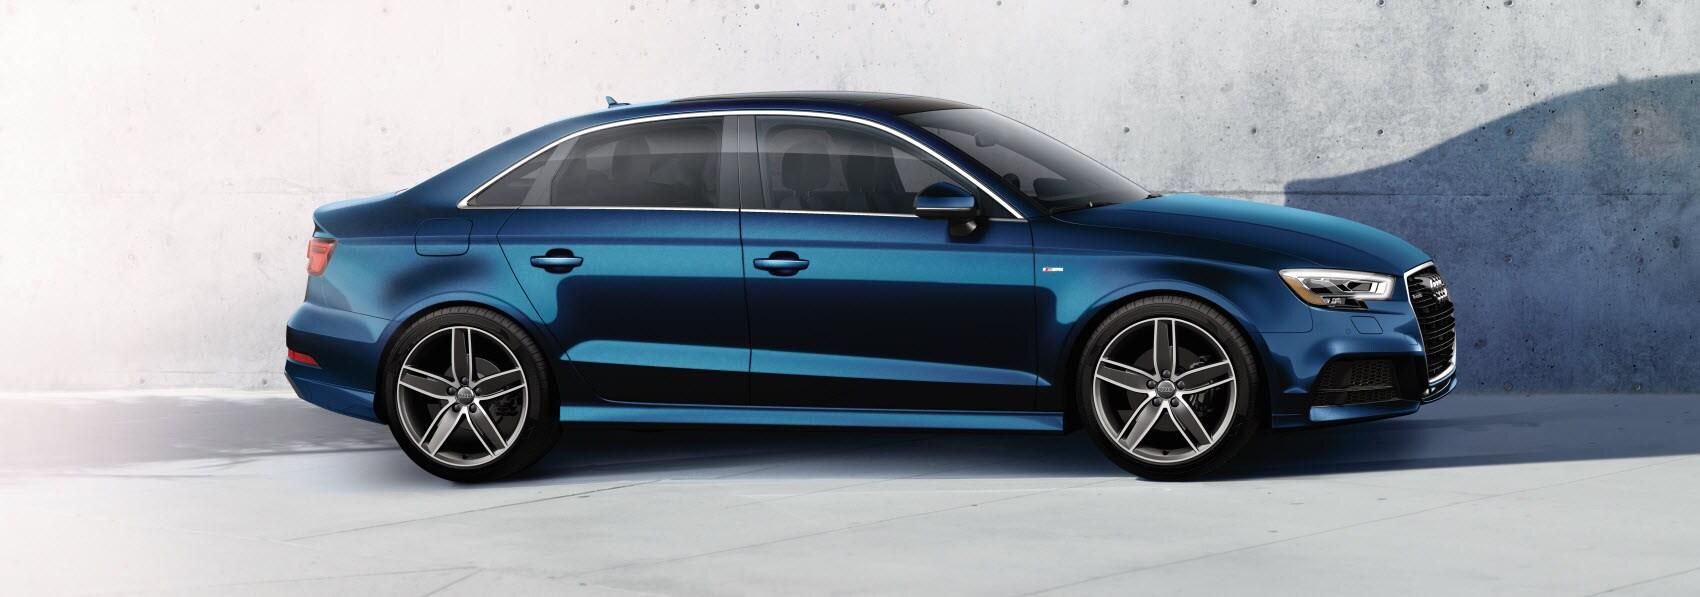 Audi A Reviews Peabody MA Ira Audi Of Peabody - Audi reviews